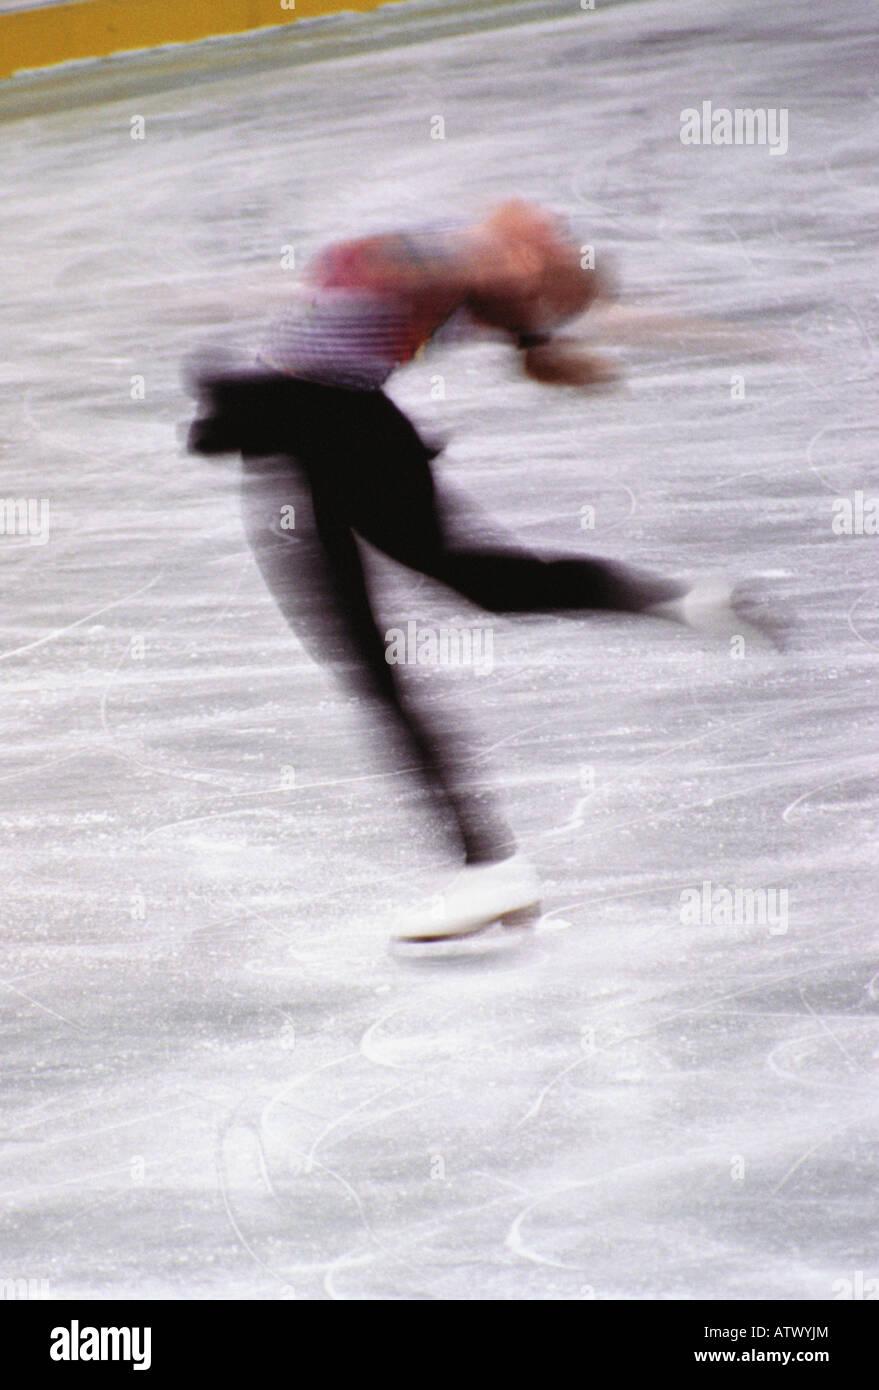 female ice skater in motion - Stock Image